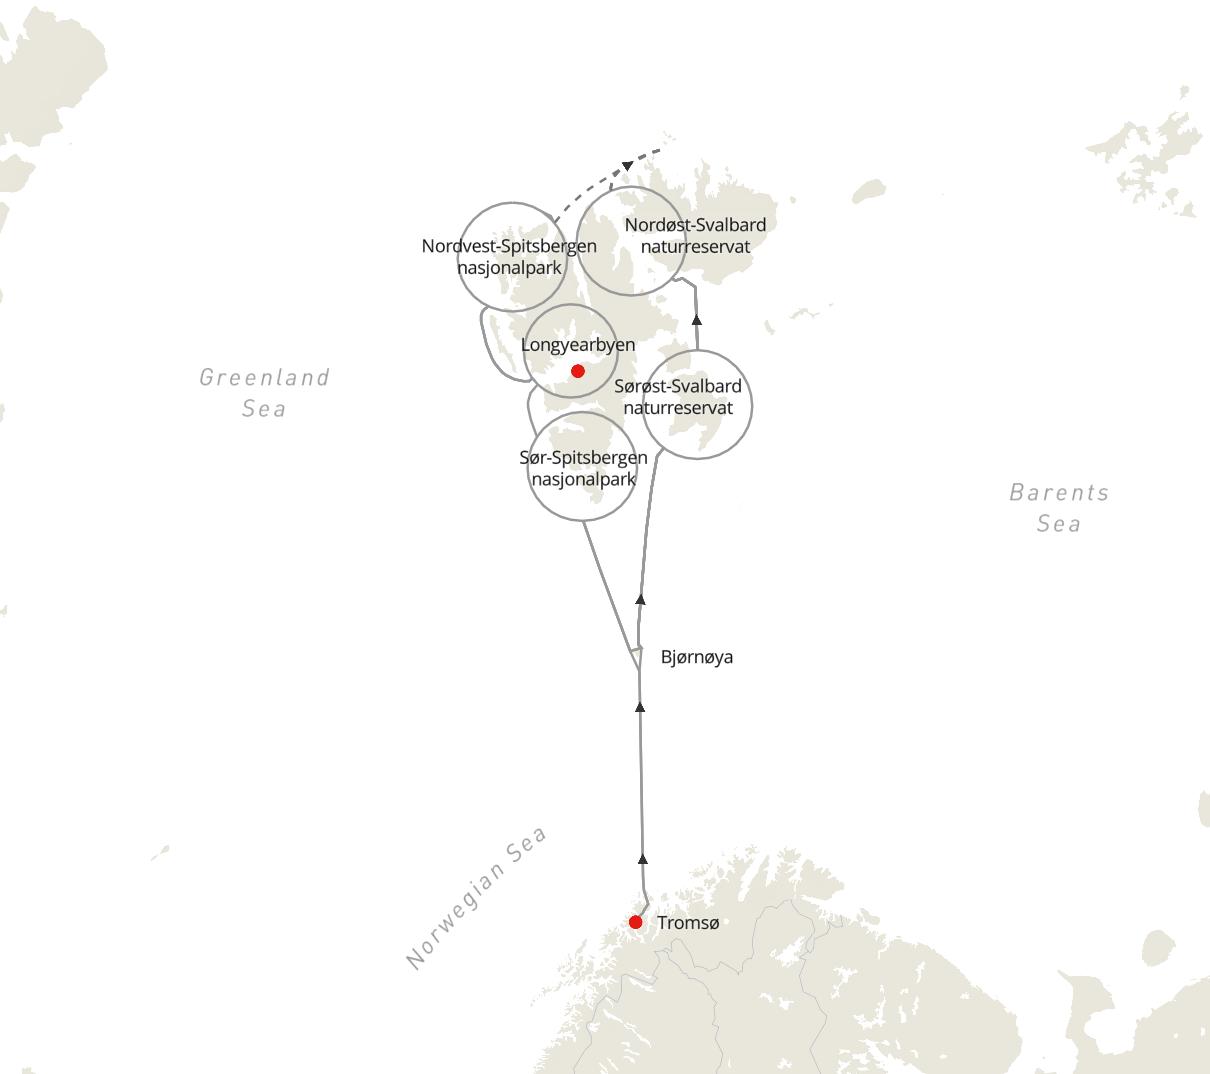 Tromsø - Svalbard - Tromsø